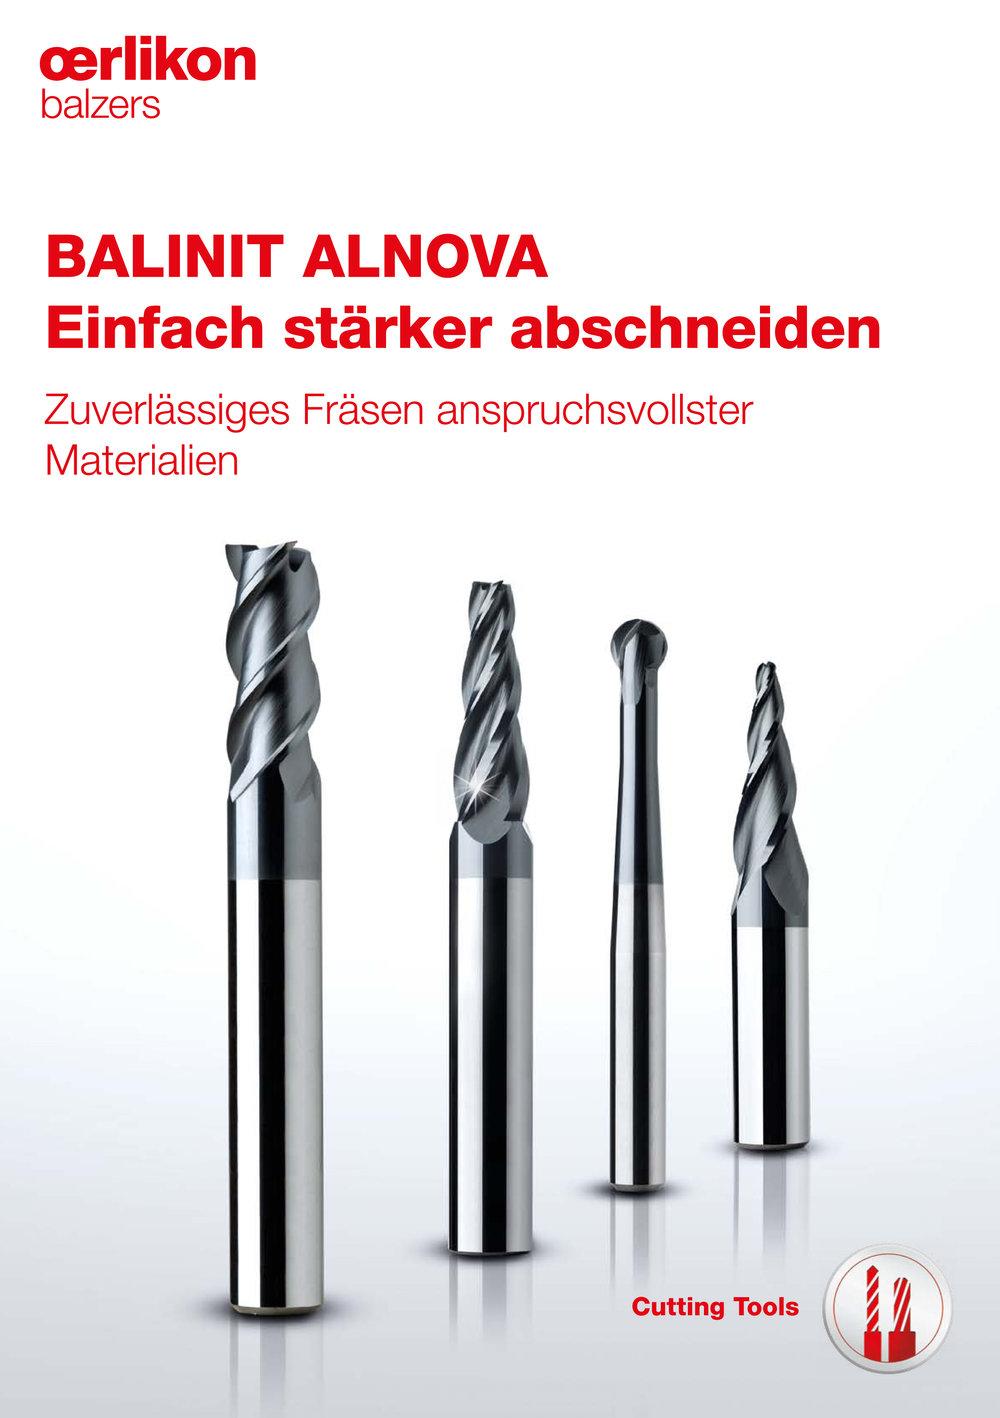 Produktbroschüre BALINIT ALNOVA - Oerlikon Balzers